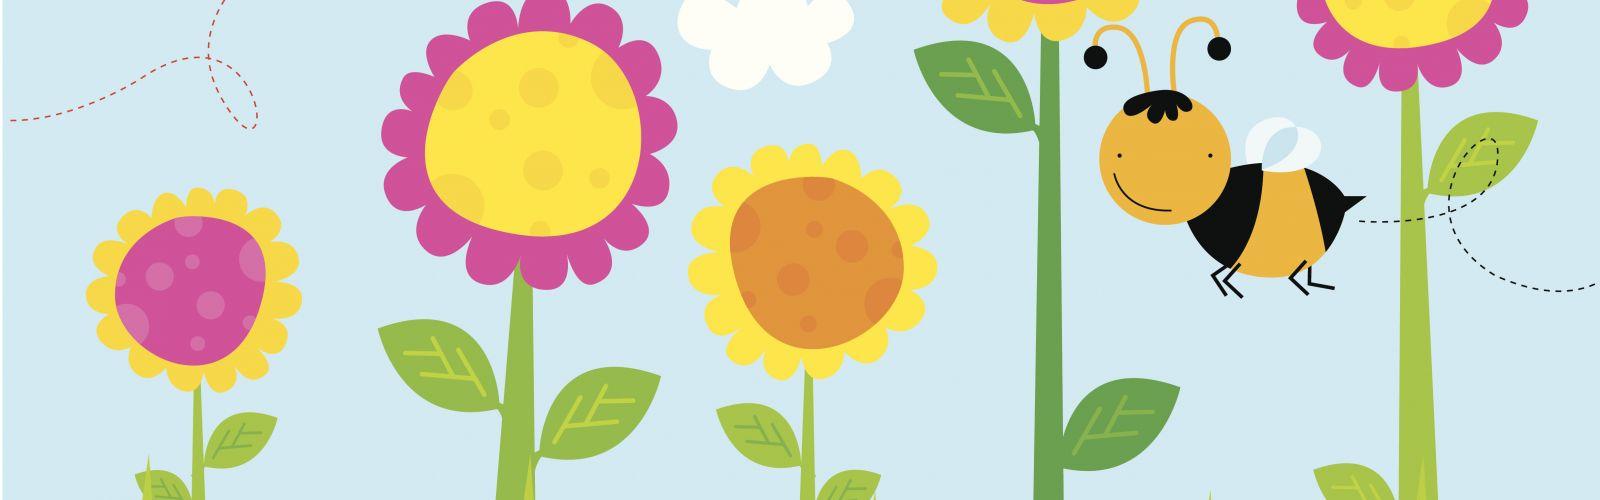 cartoon bugs and flowers